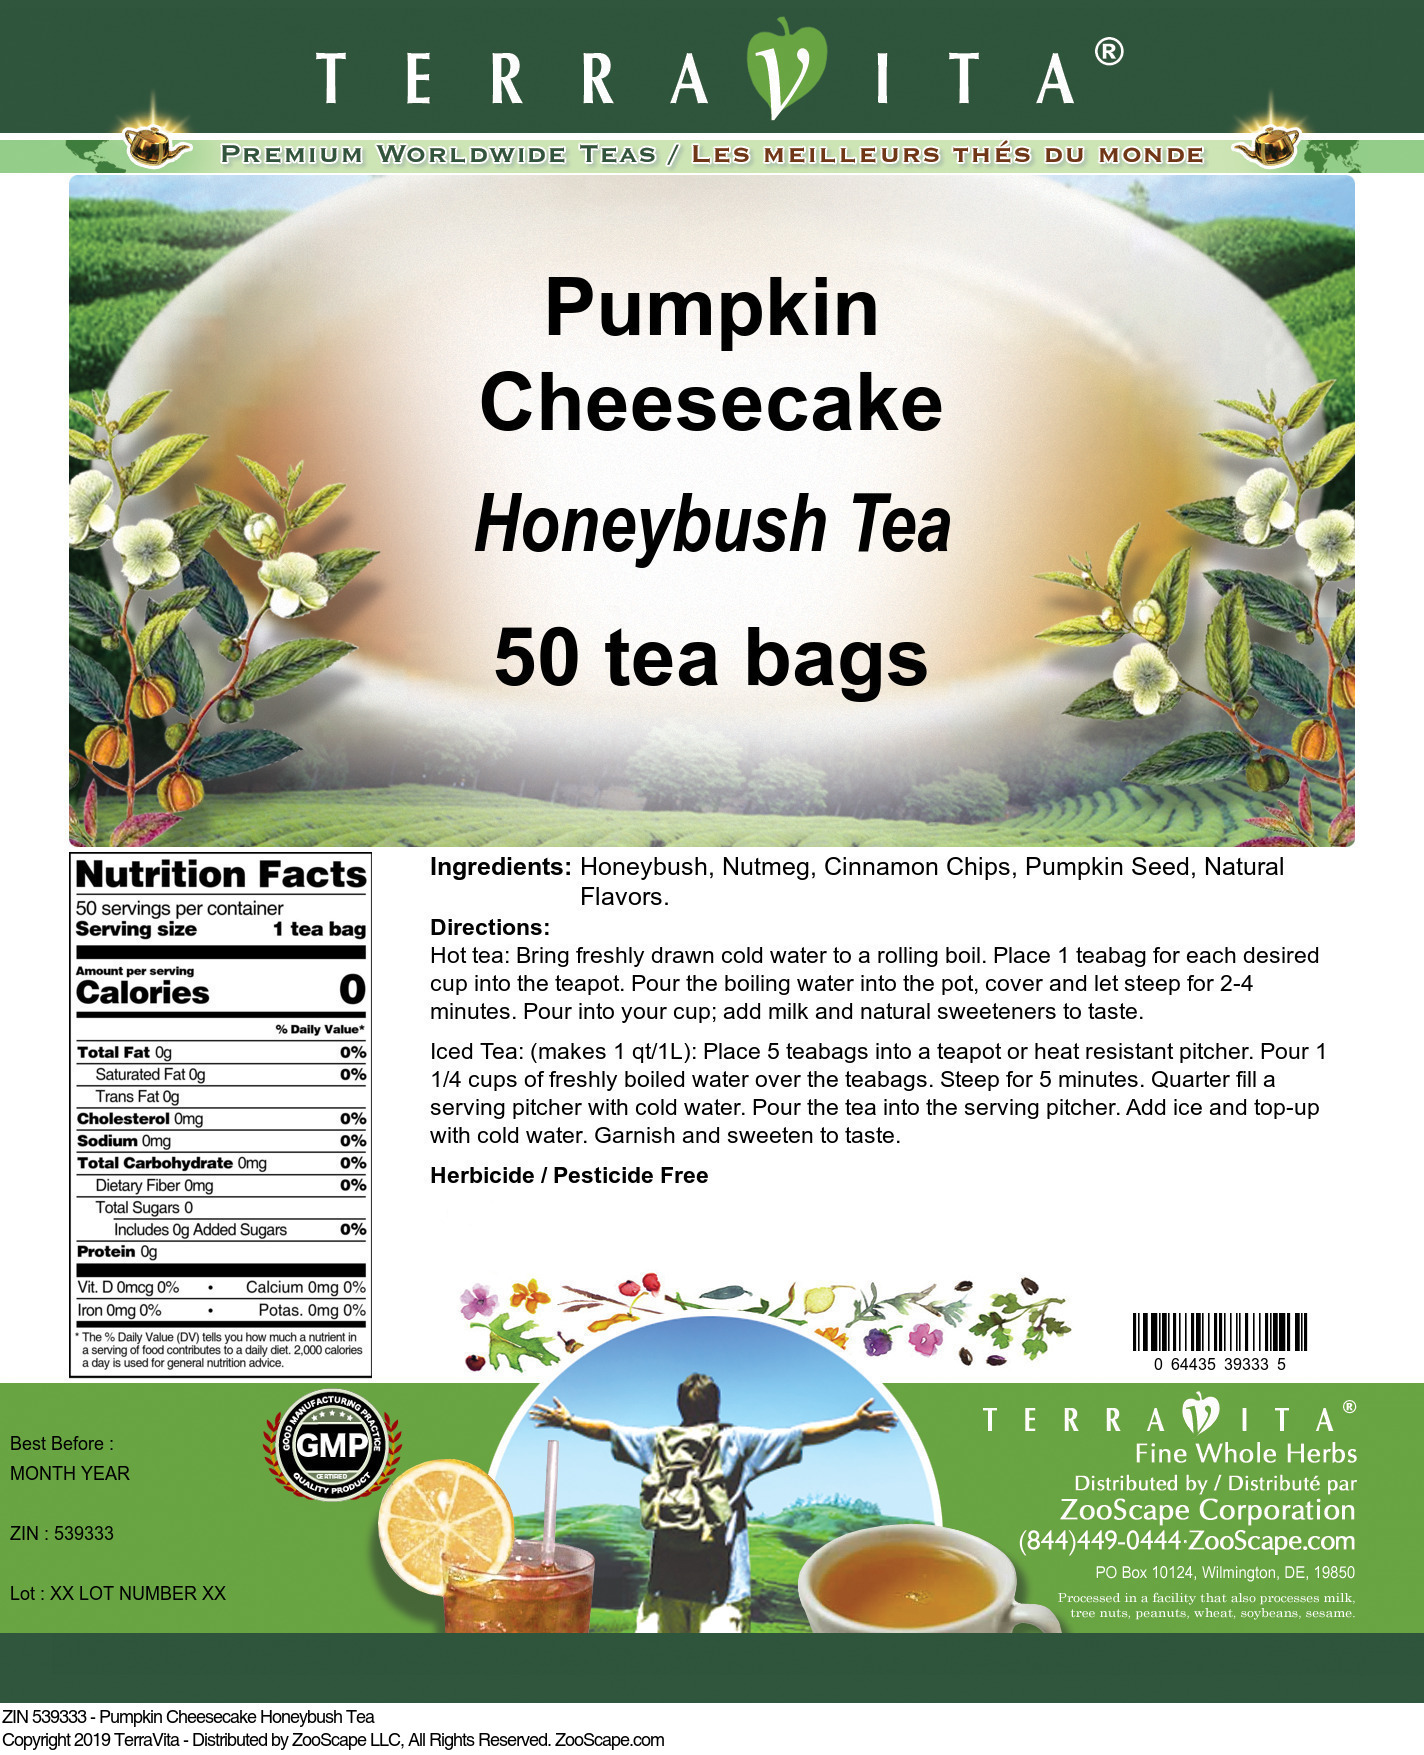 Pumpkin Cheesecake Honeybush Tea